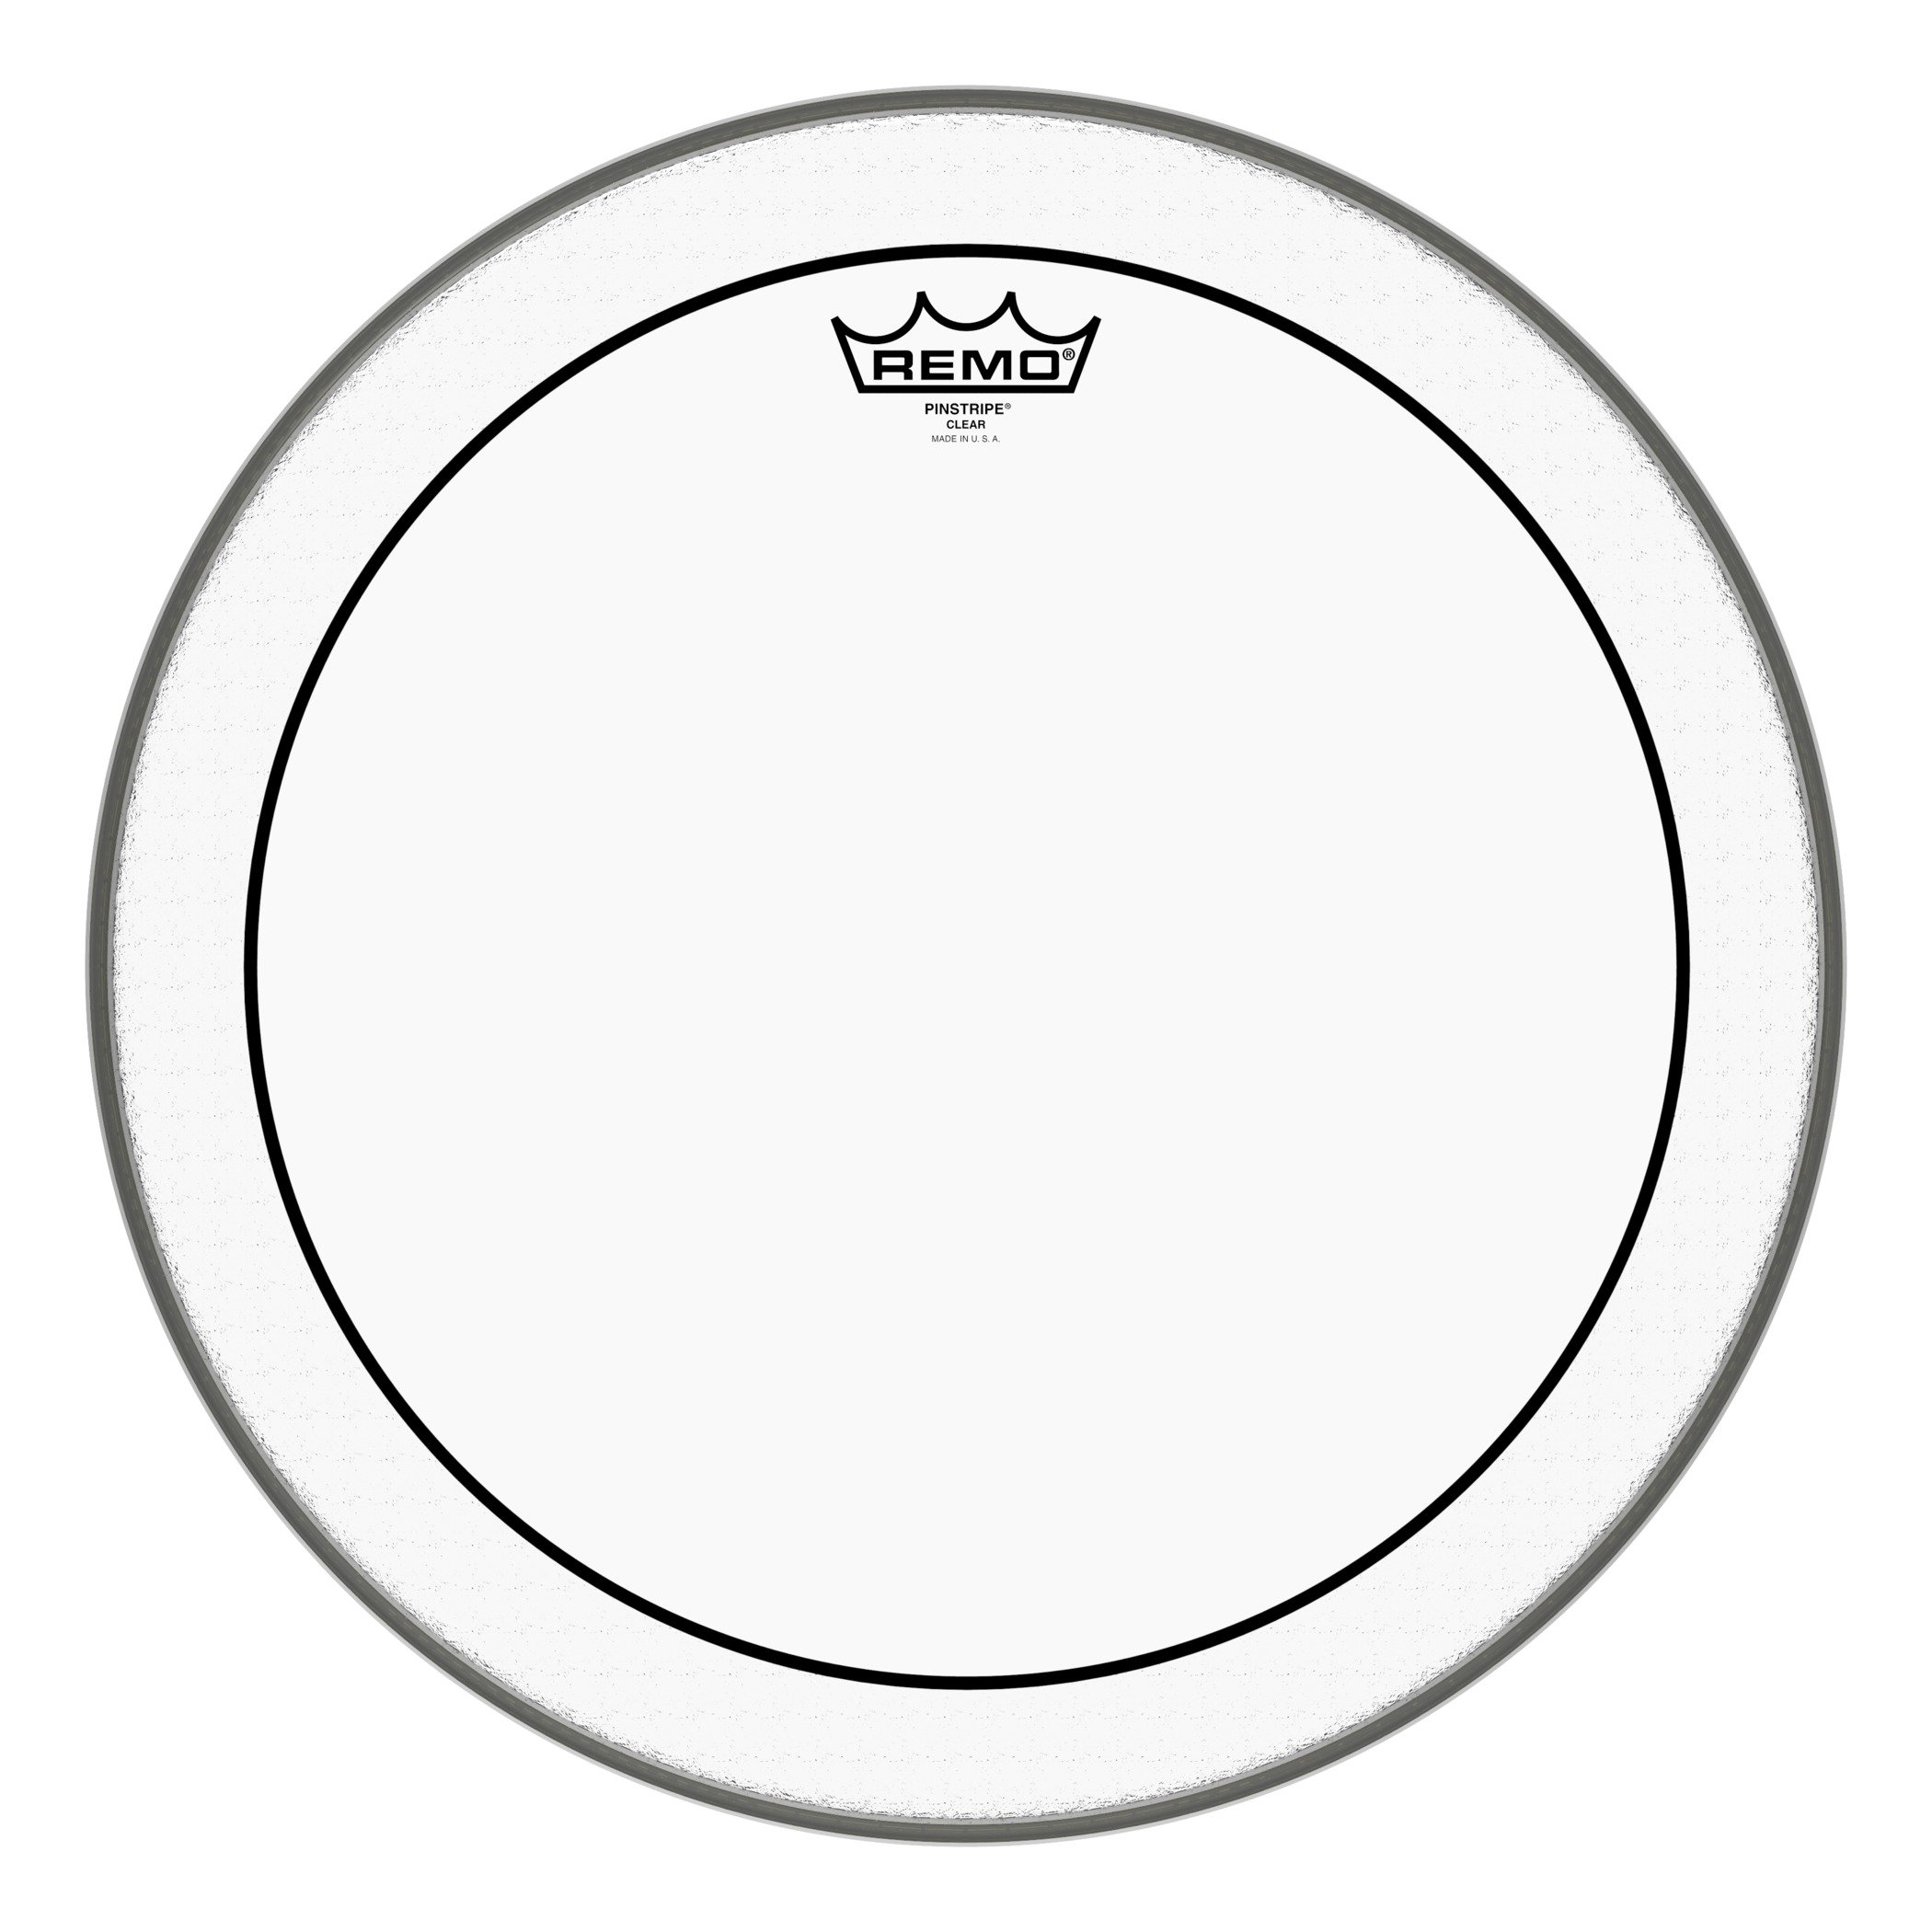 Remo Pinstripe Clear Drumhead, 16''